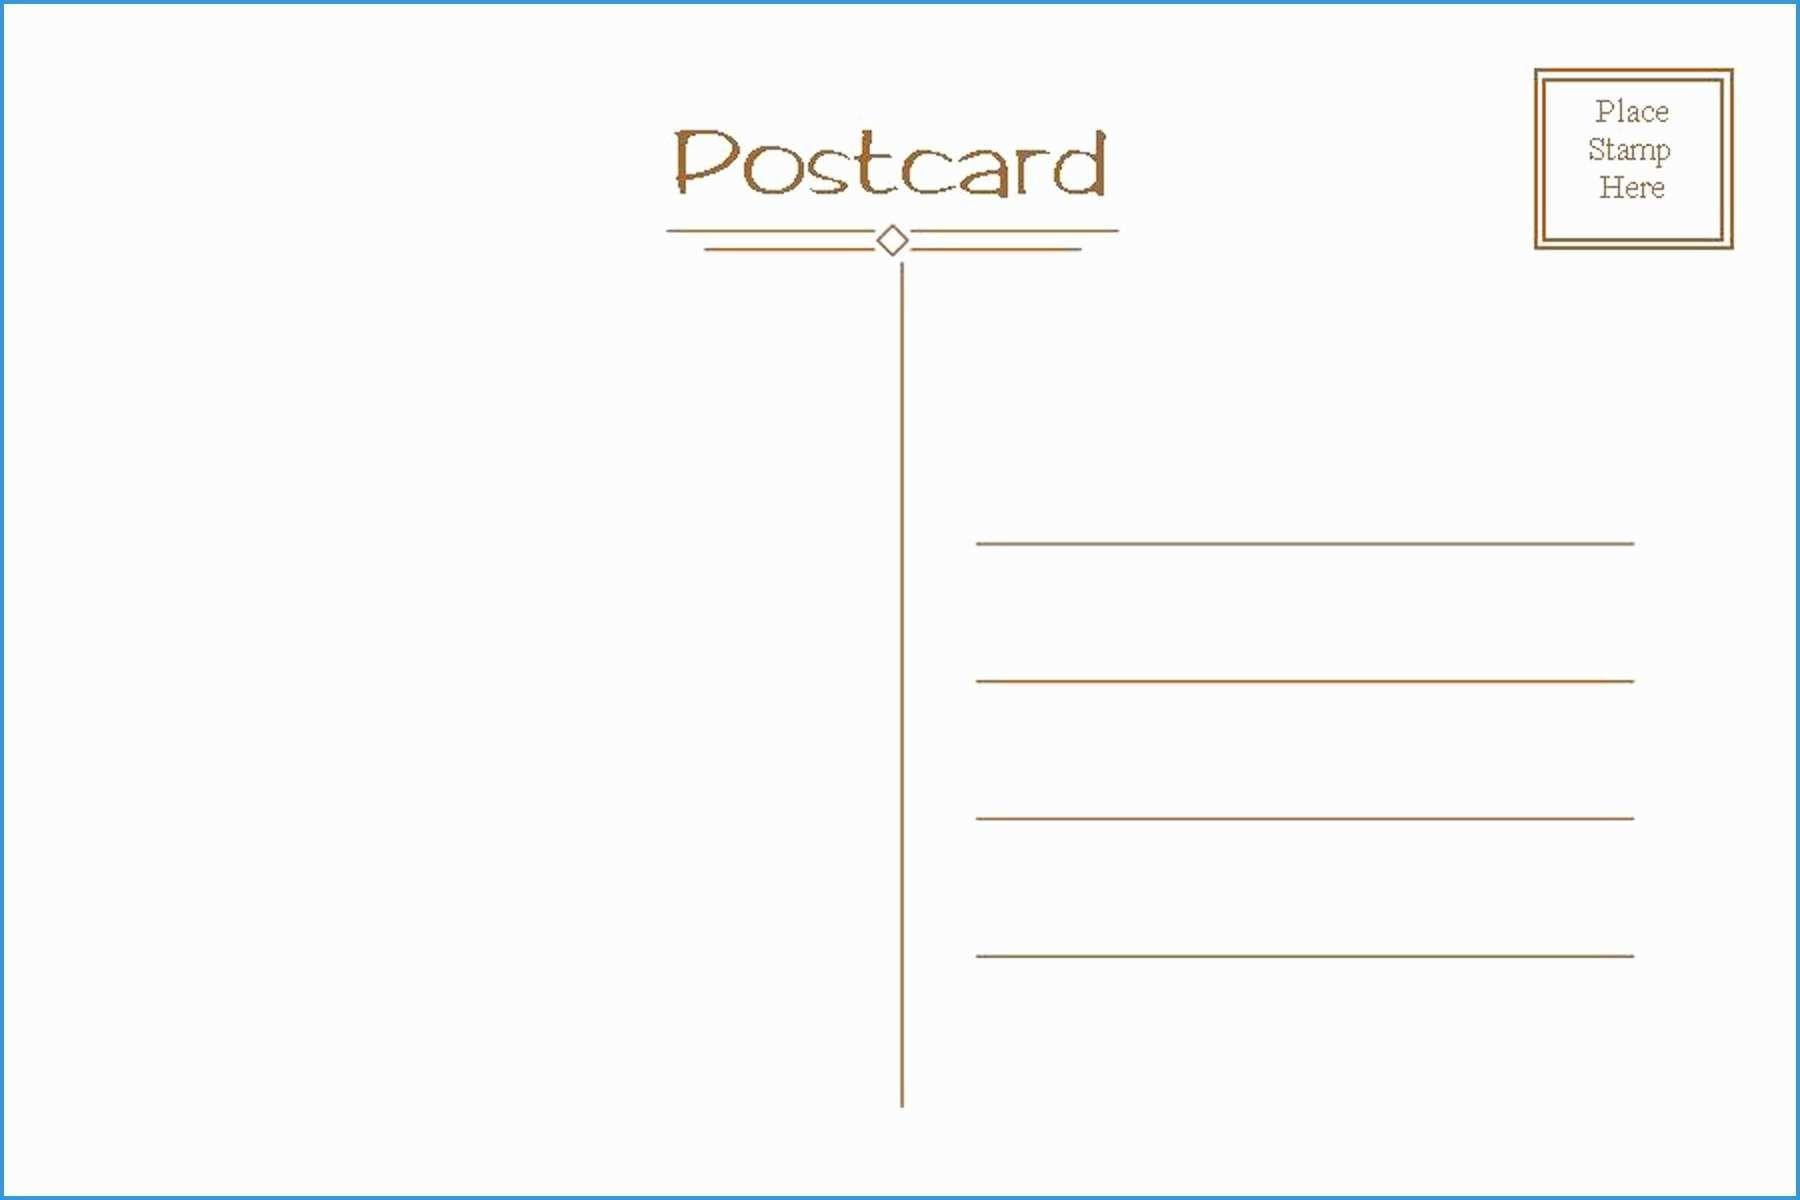 Free Postcard Template Elegant Postcard Template Free Postcard